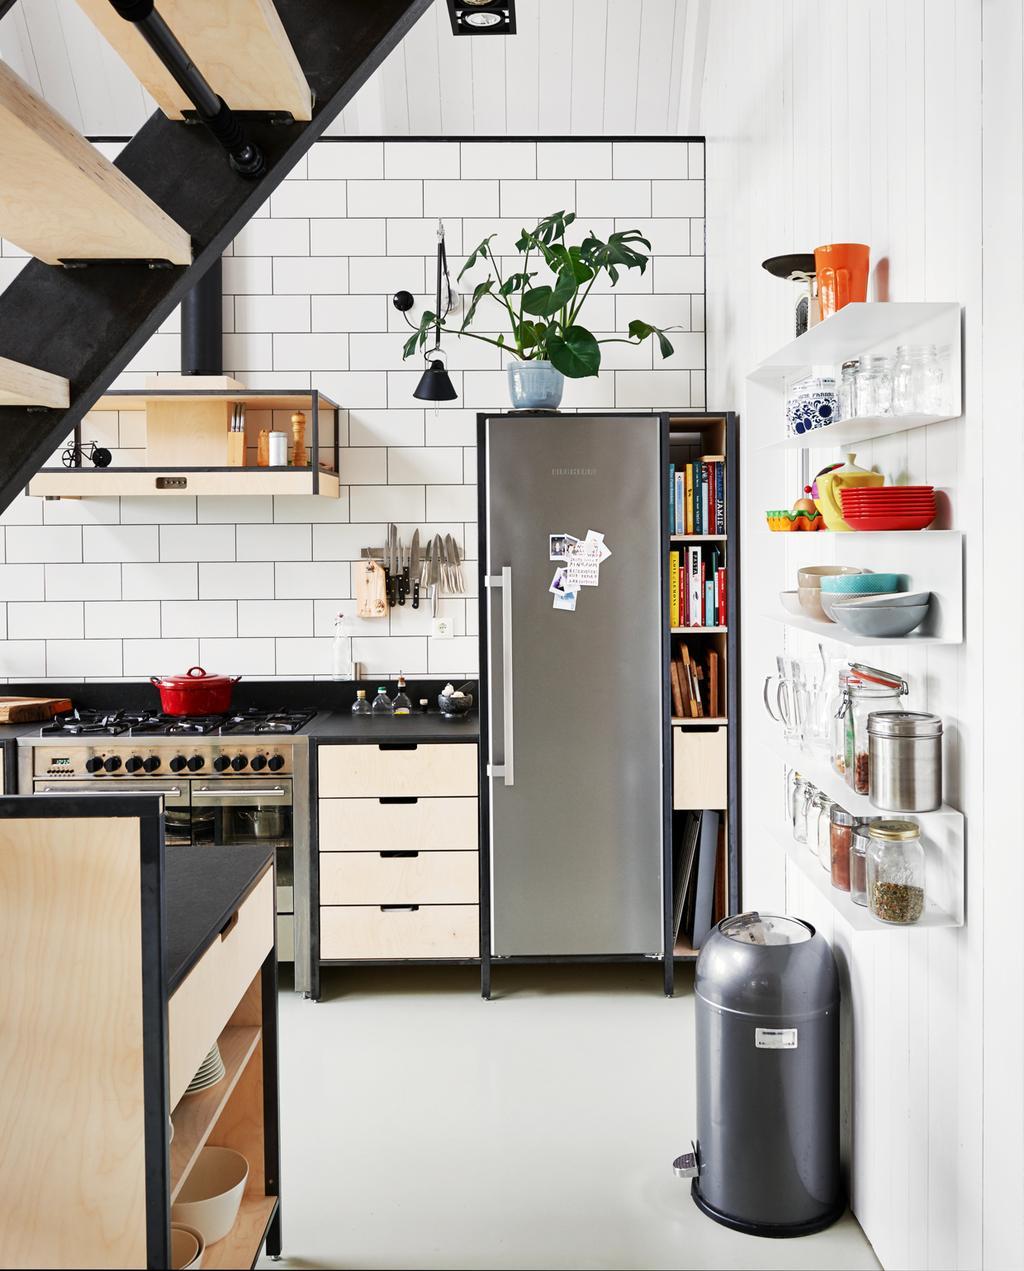 vtwonen binnenkijken special 2019 | keuken hout en zwart